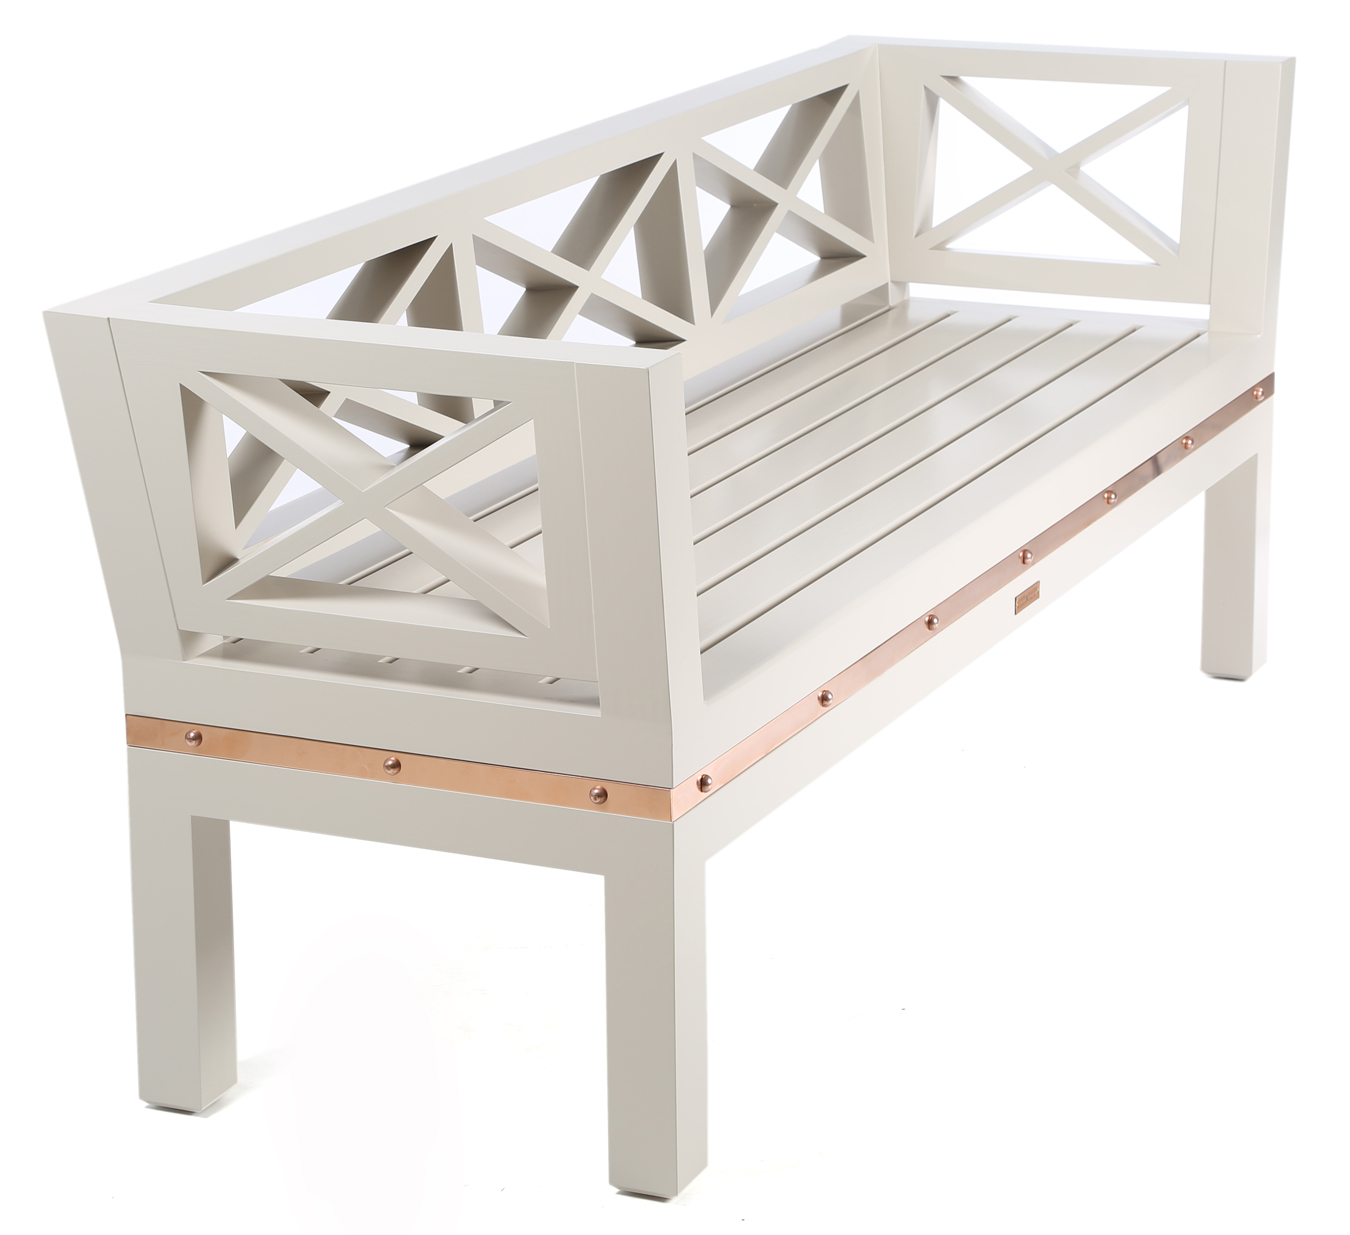 3. Multi-purpose garden furniture